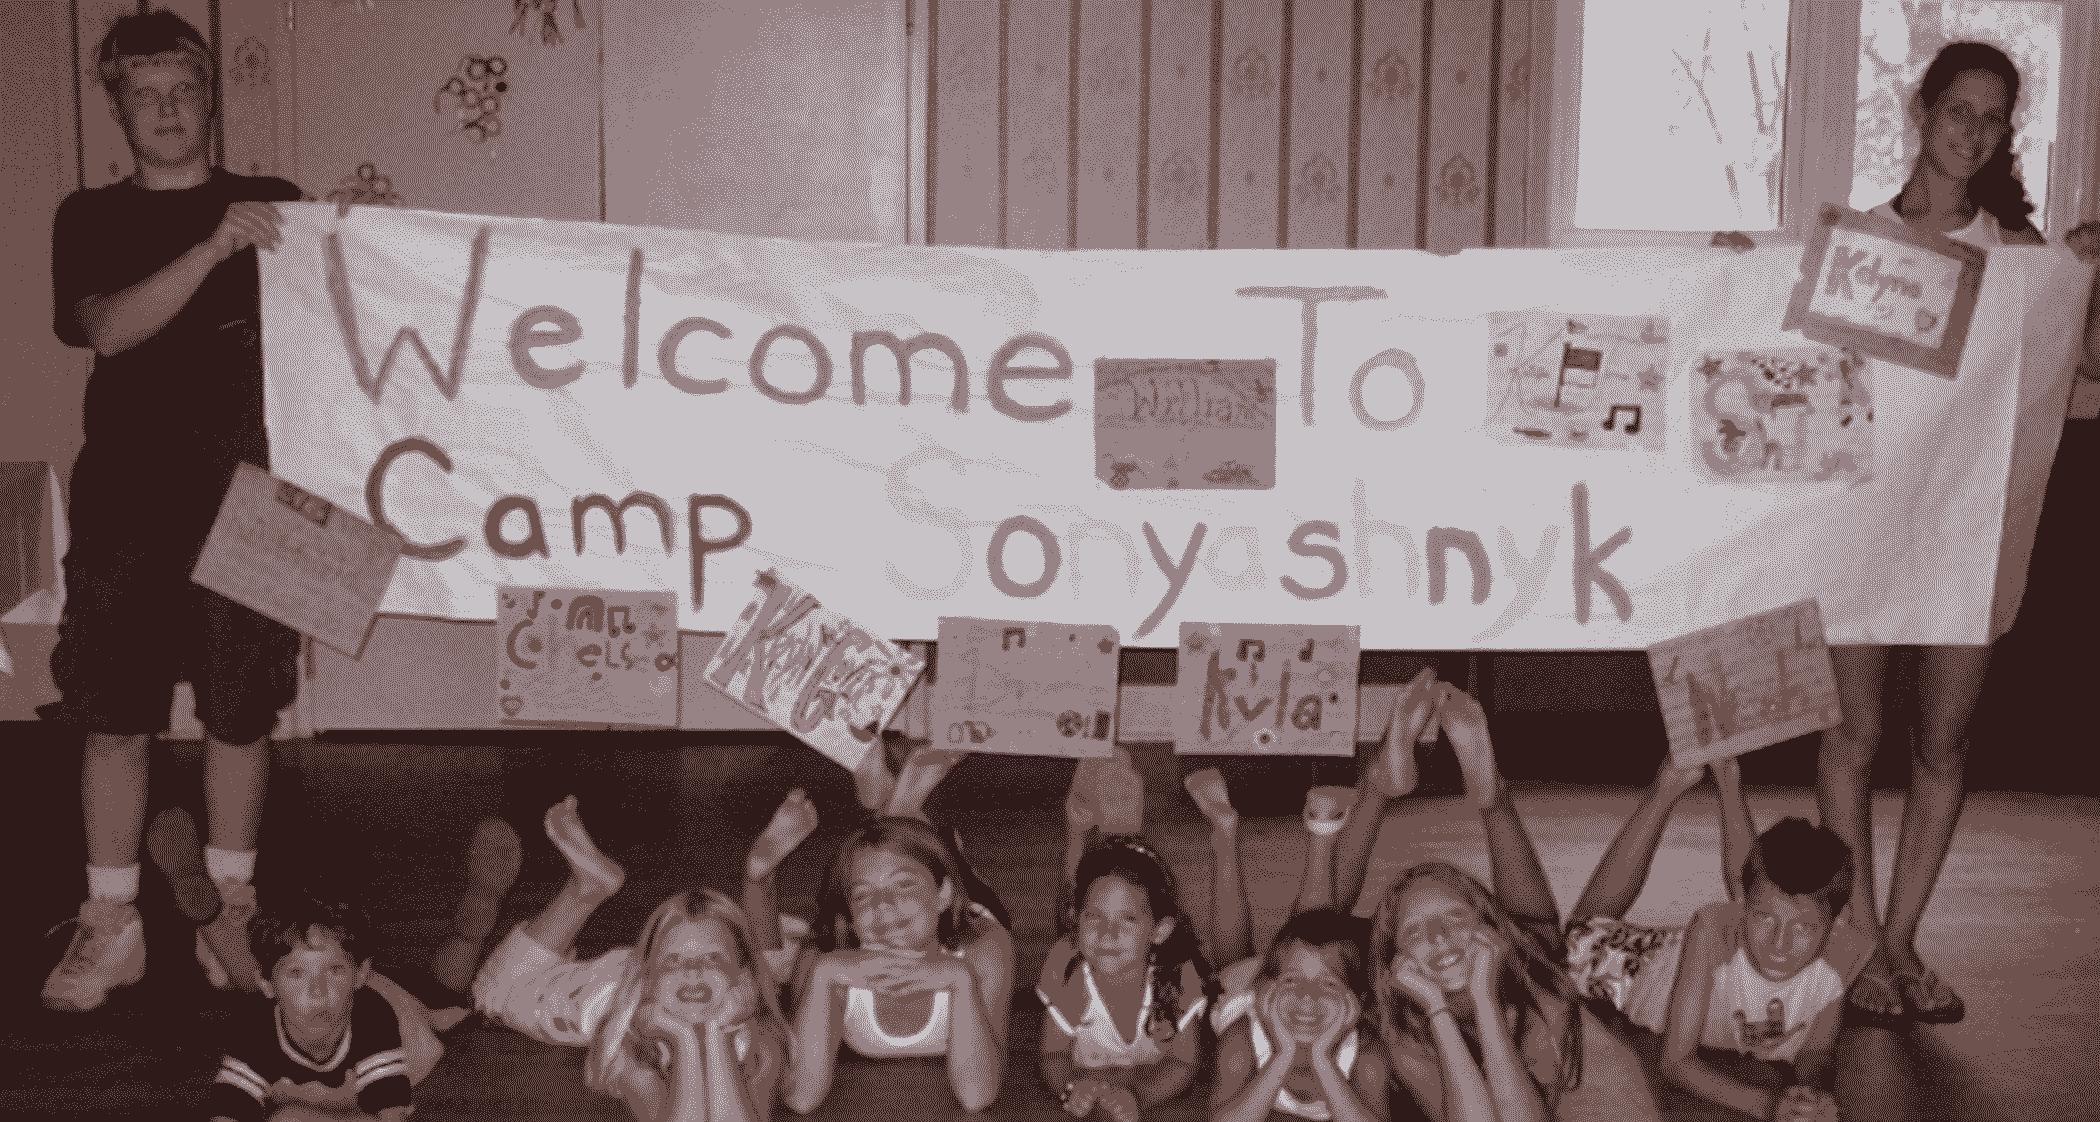 SONIASHNYK NATIONAL DAY CAMPS